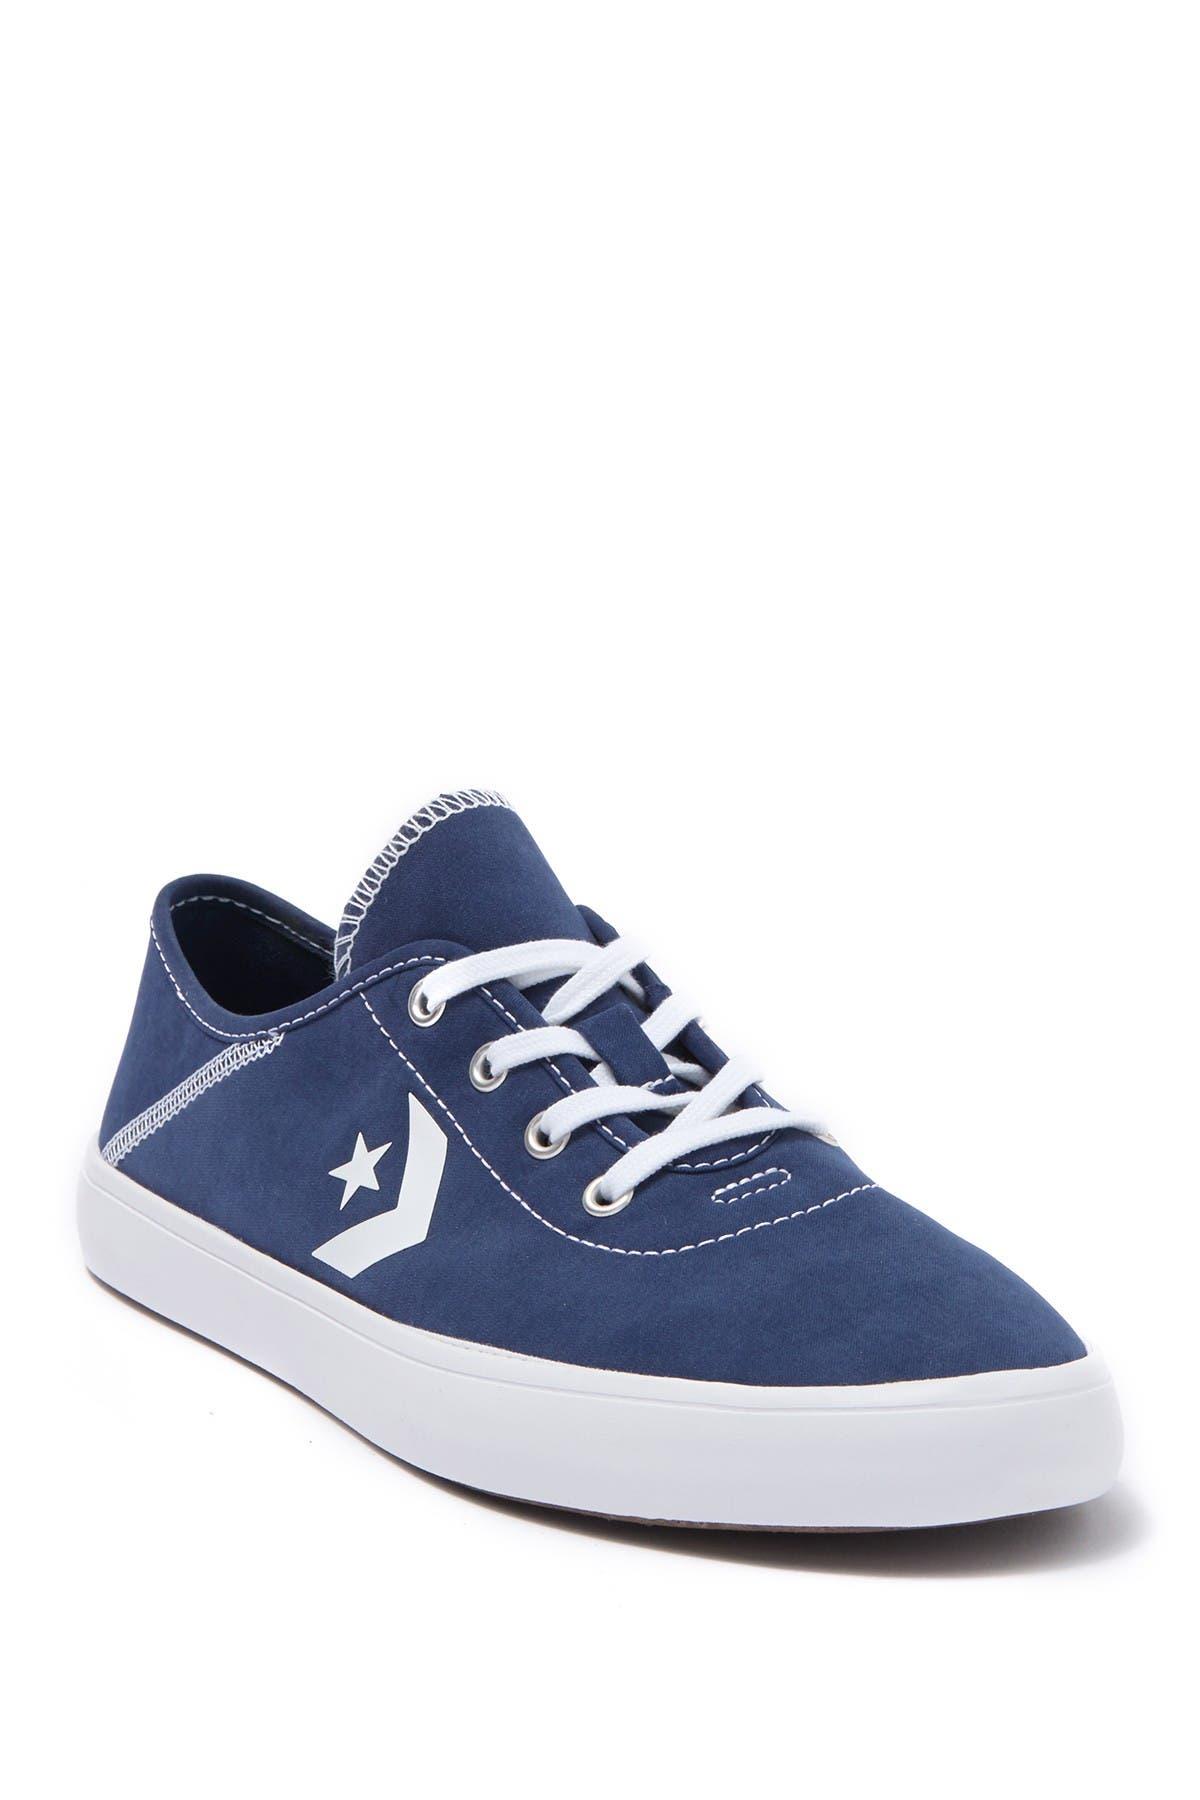 Converse | Costa Low Top Sneaker